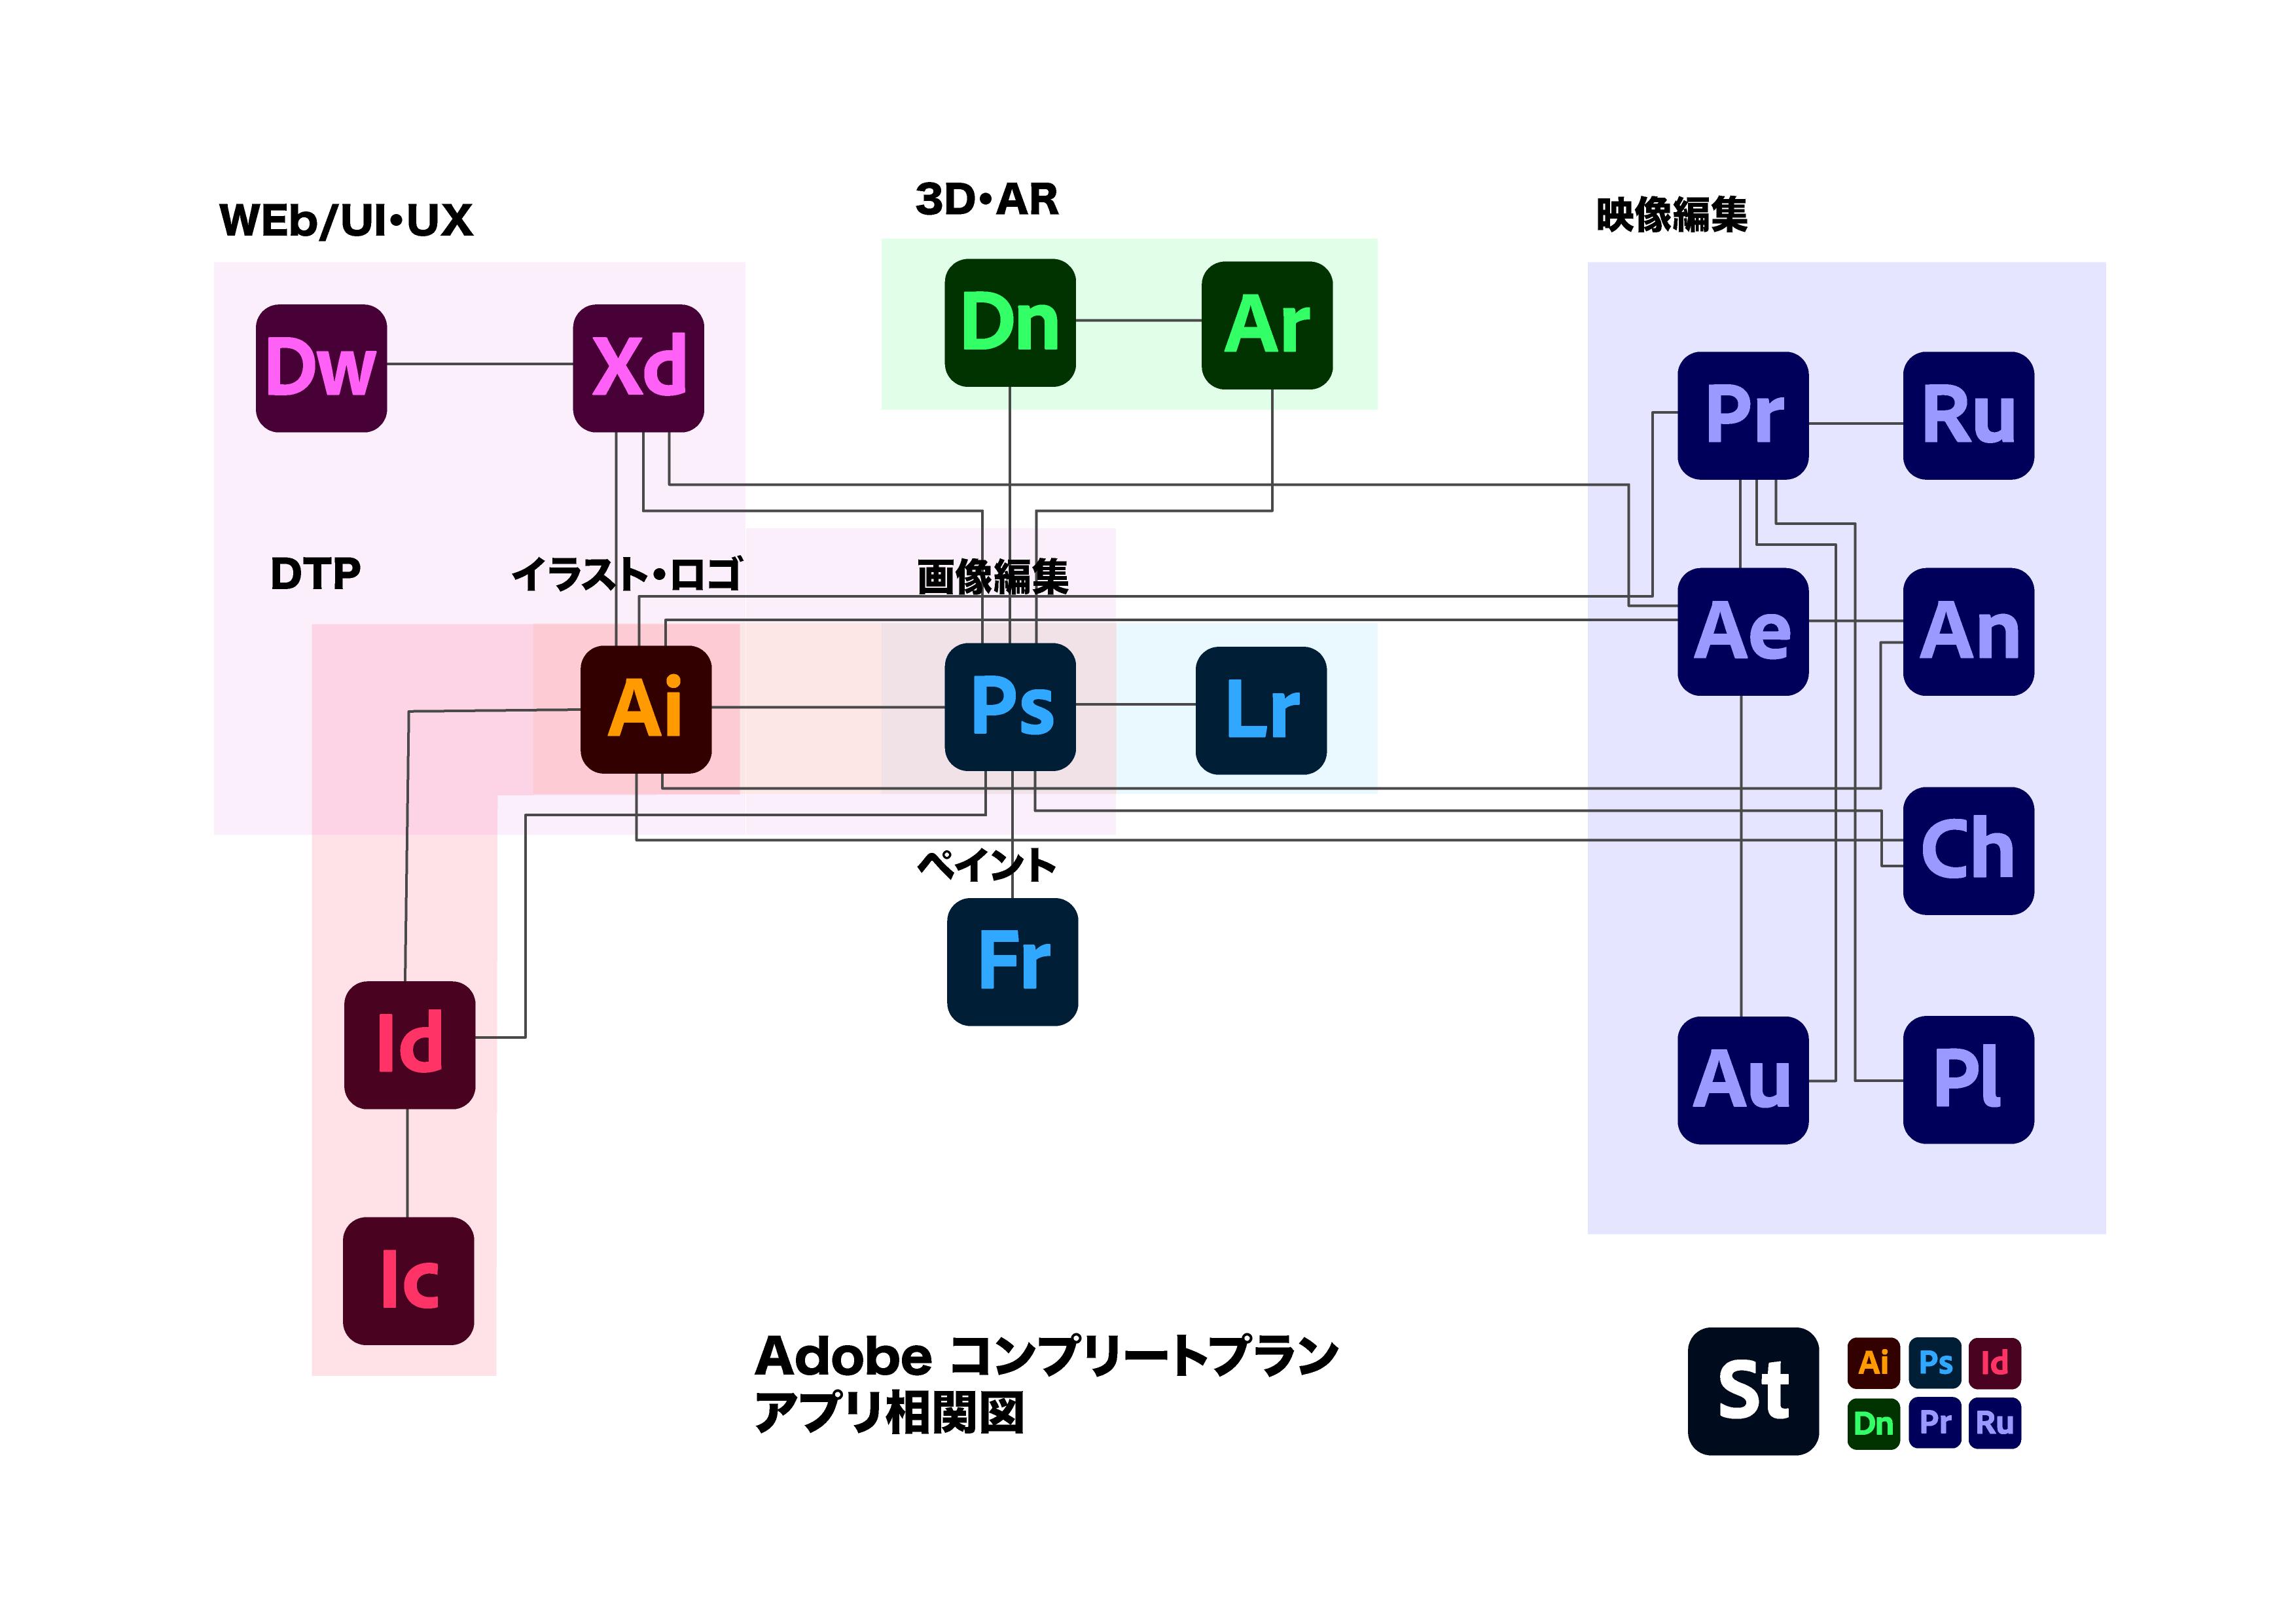 Adobe all apps 01